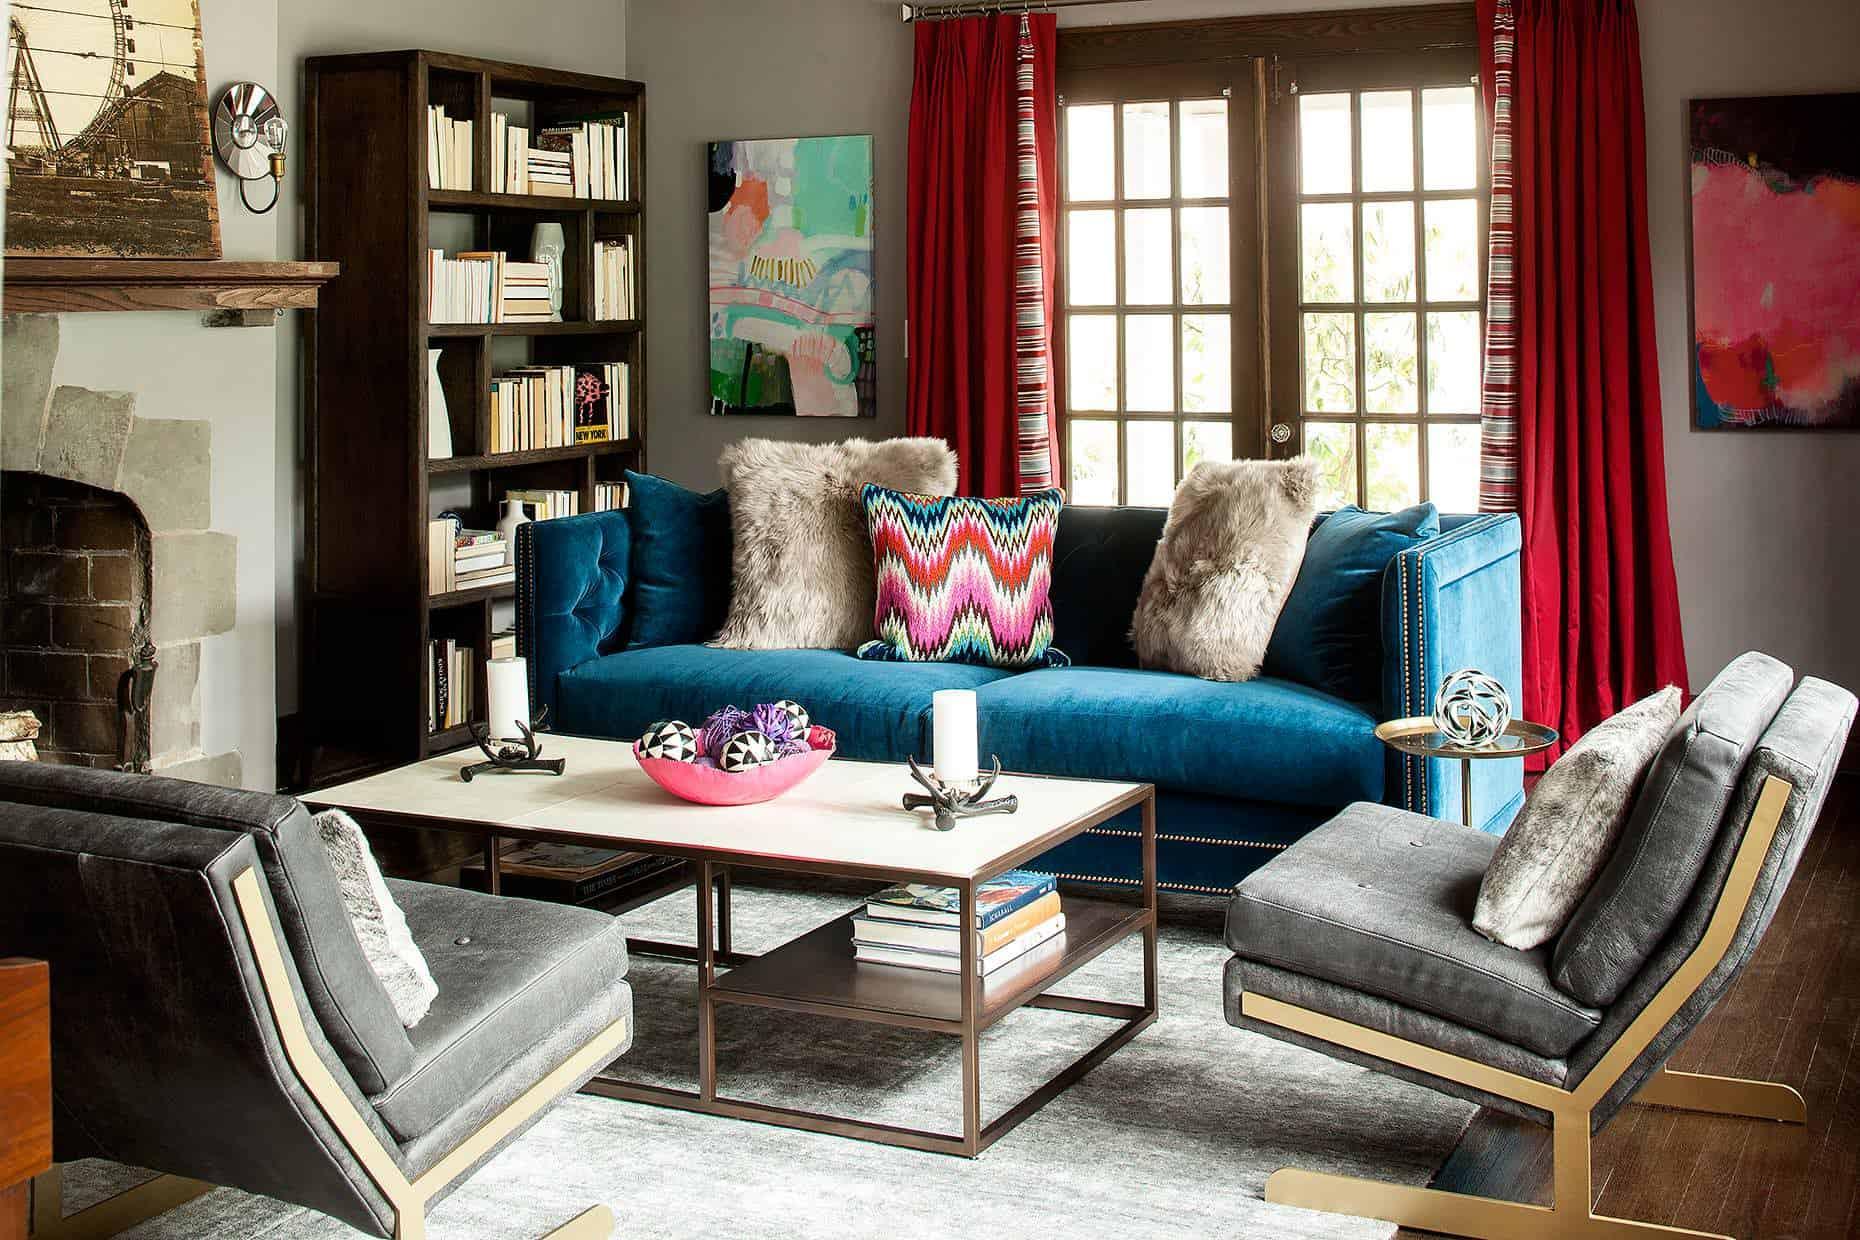 velvet-blue-boemian-tuxedo-sofa-couch-diy-ideas-grey-modern-chairs-farmhouse-new-york-red-drapes-brass-coffee-table-grey-living-room-shop-room-ideas